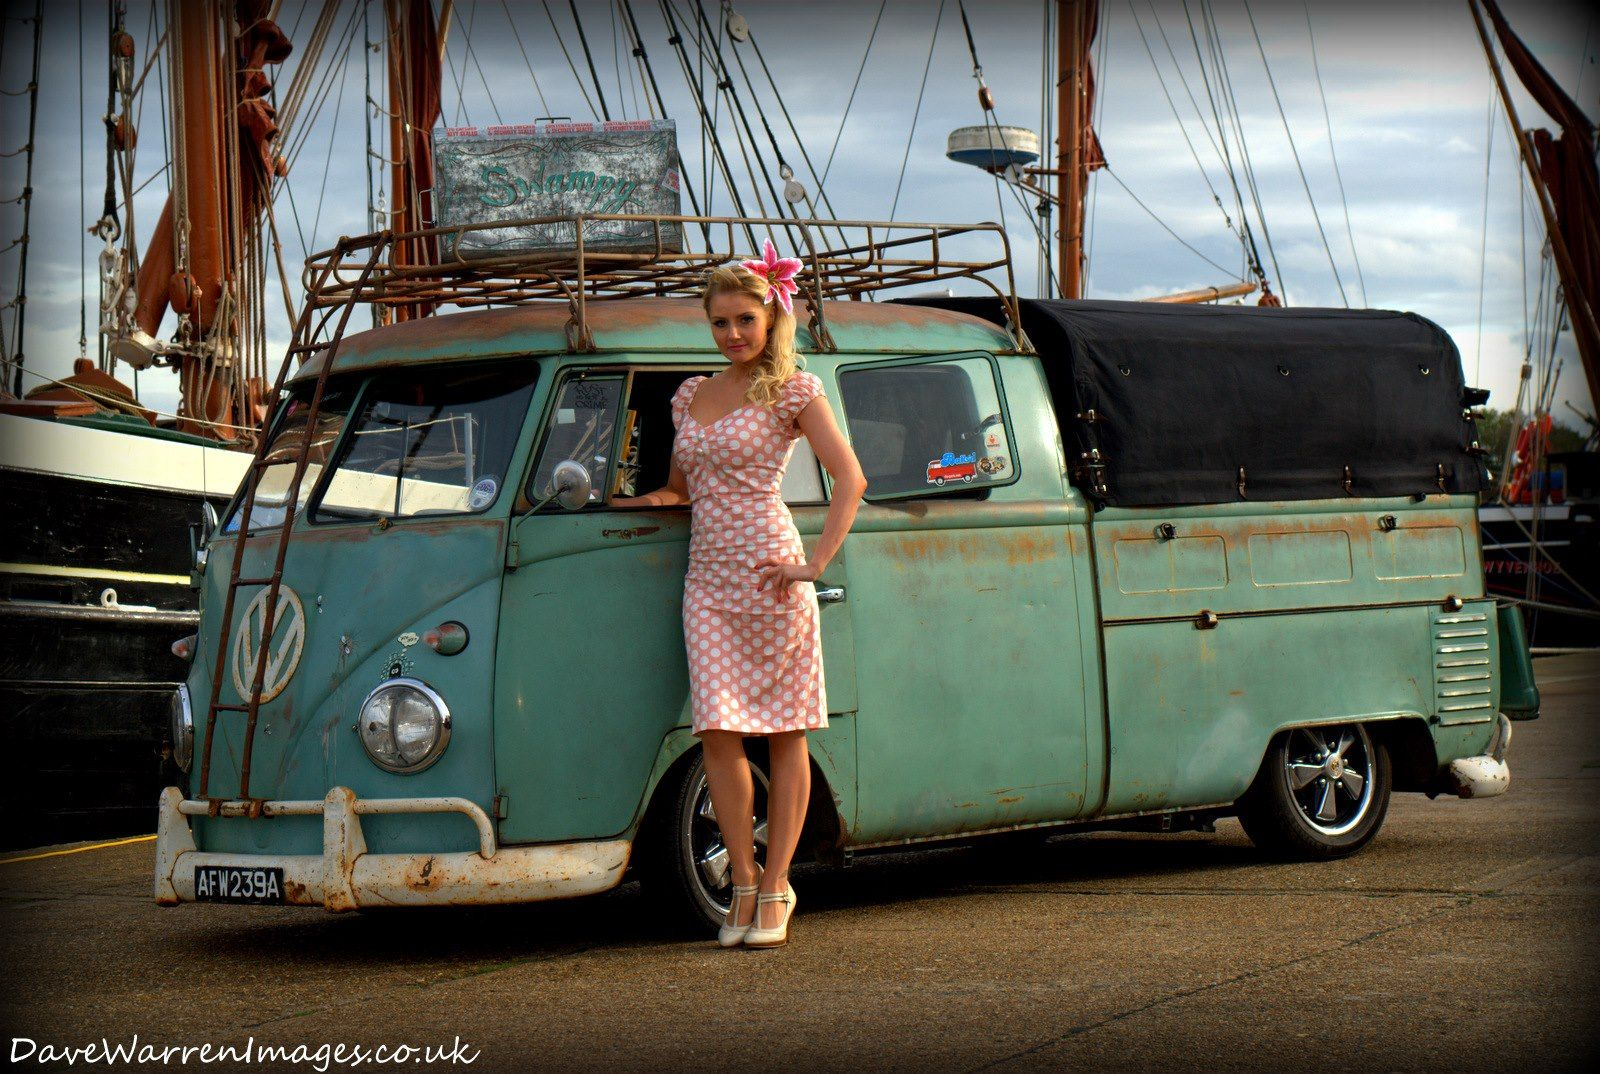 Amazing Vw bus # Beautiful Pin-up. ♤ # van # classic # old school ♤. X Bros Apparel Vintage Motor T-shirts, VW Beetle & Bus T-shirts, Great price